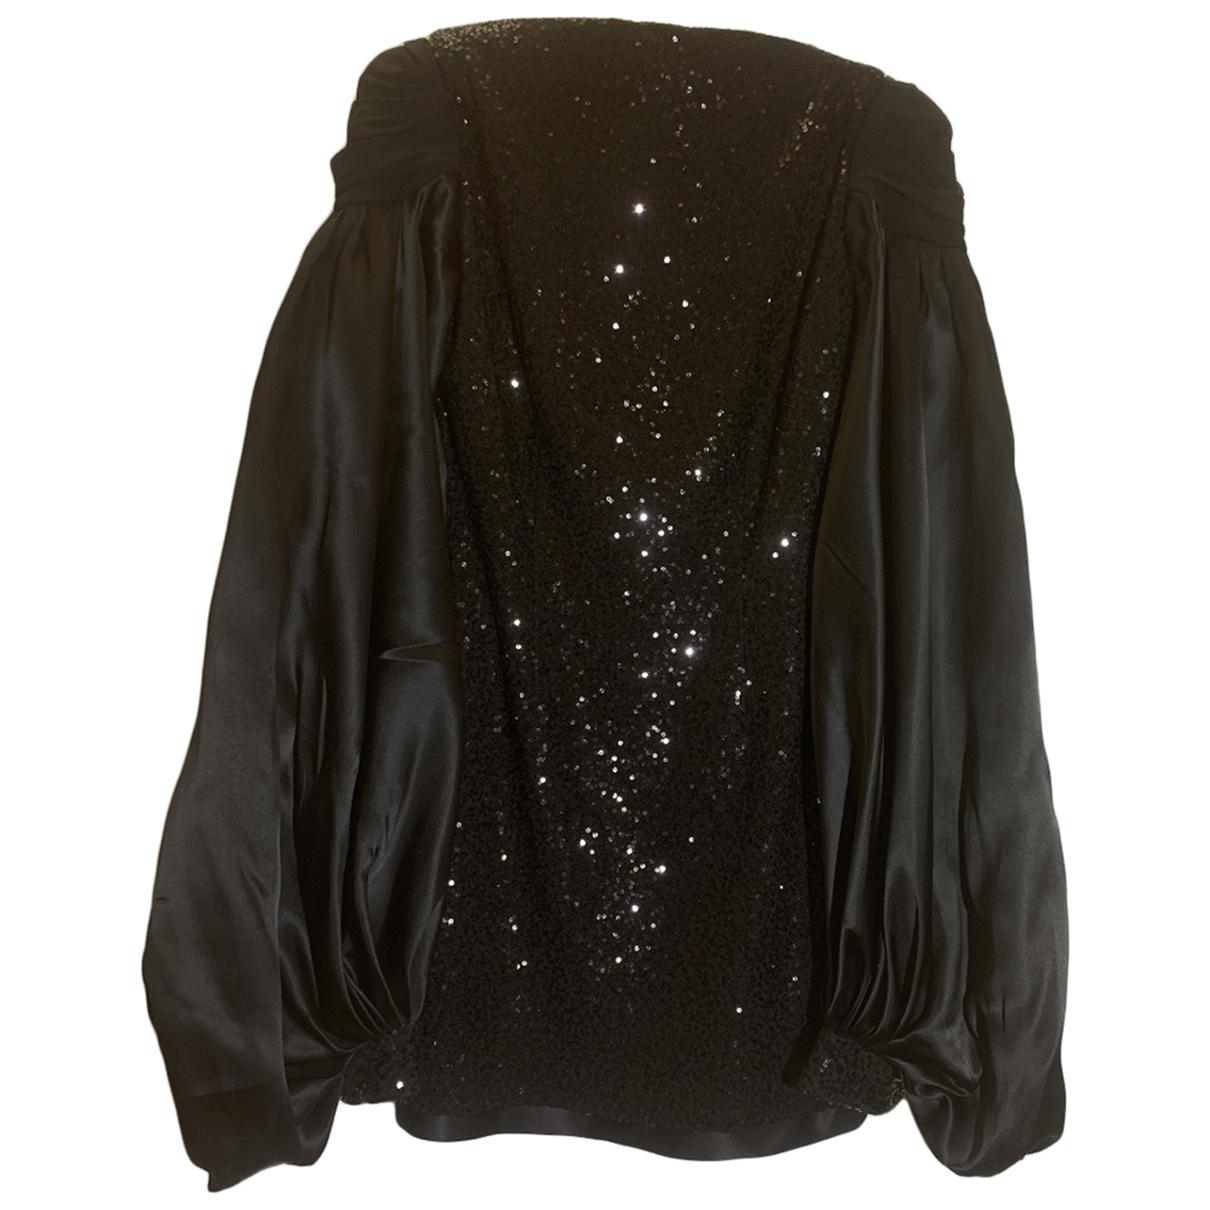 Balmain \N Kleid in  Schwarz Polyester